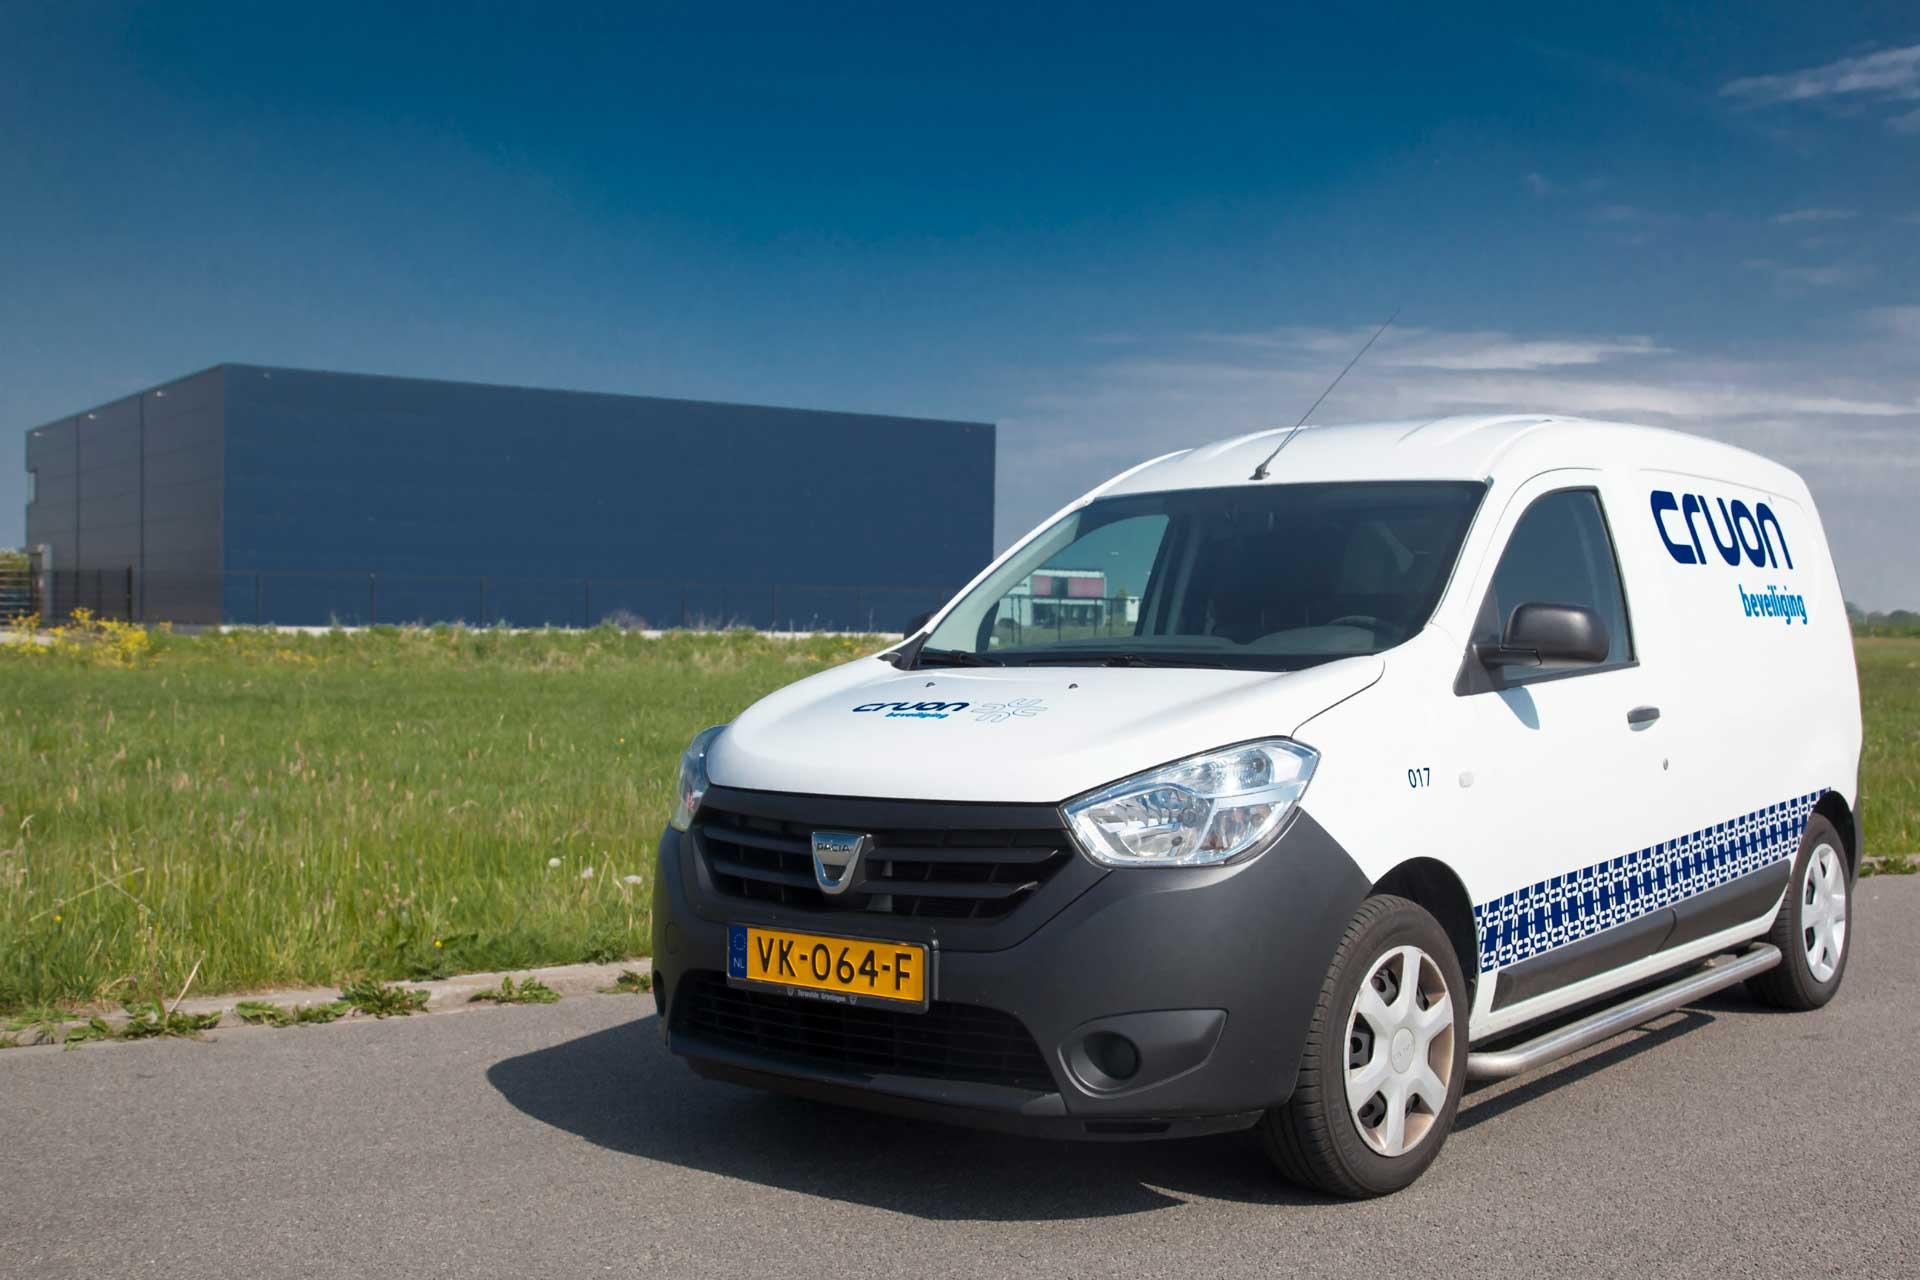 surveillance auto beveiligingsbedrijf Cruon